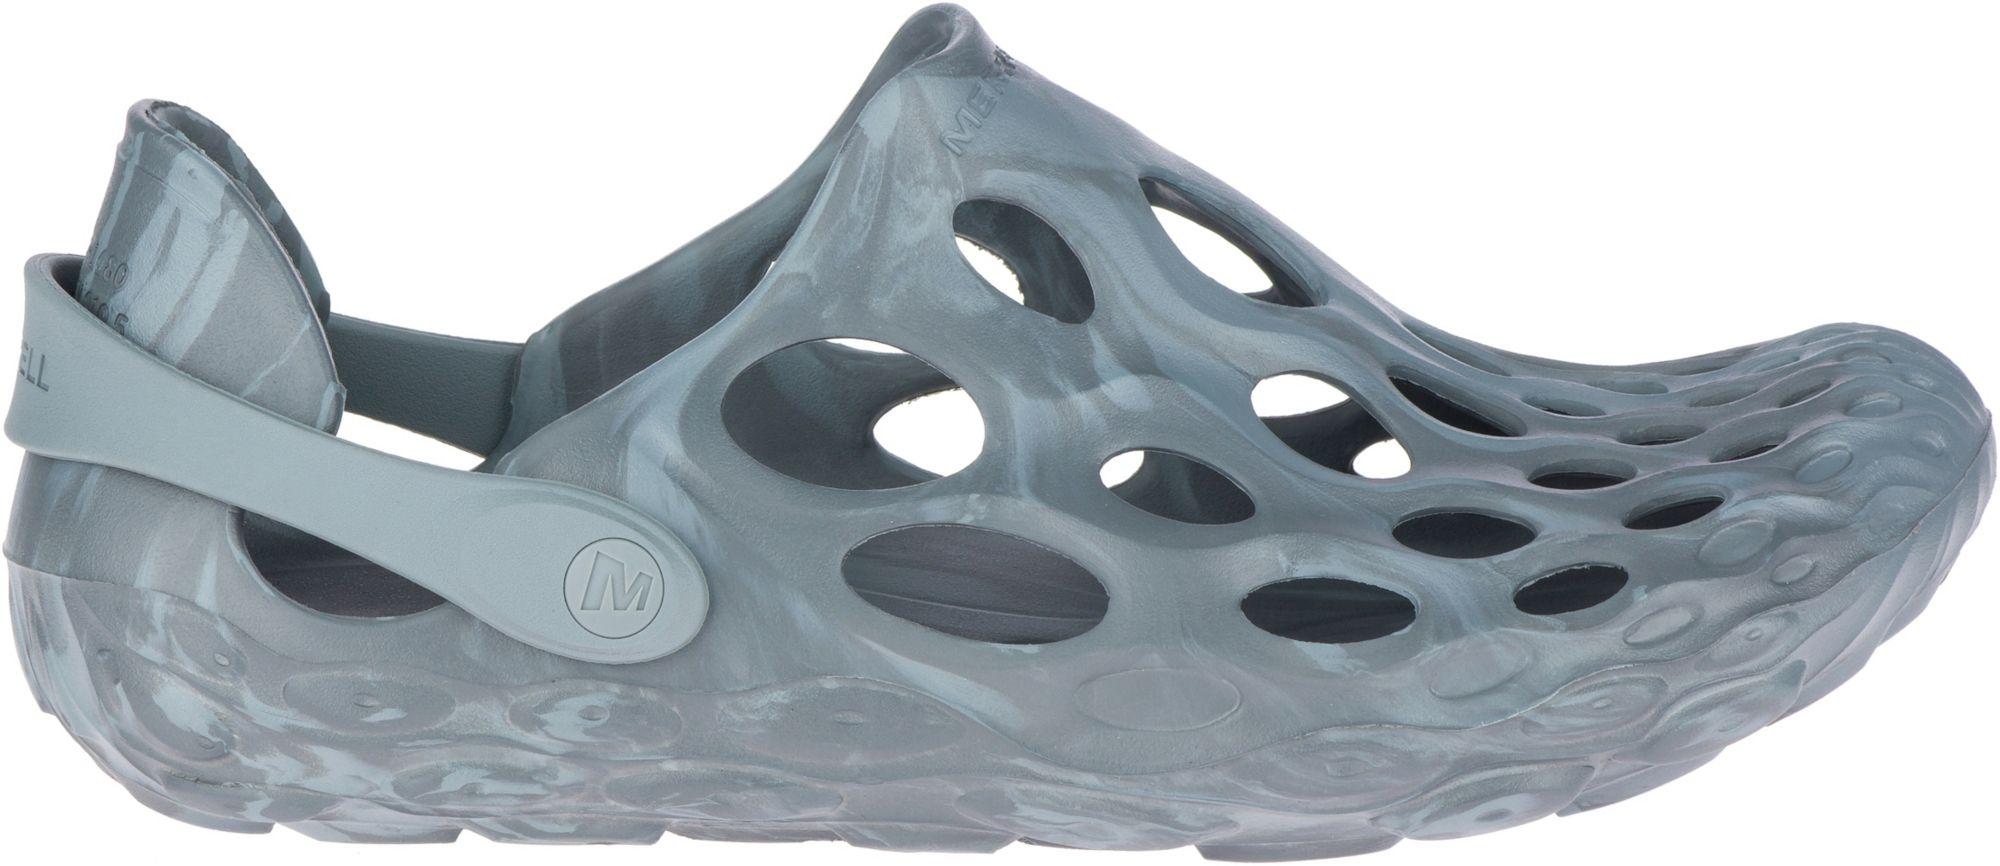 merrell mens hydro moc water shoe no